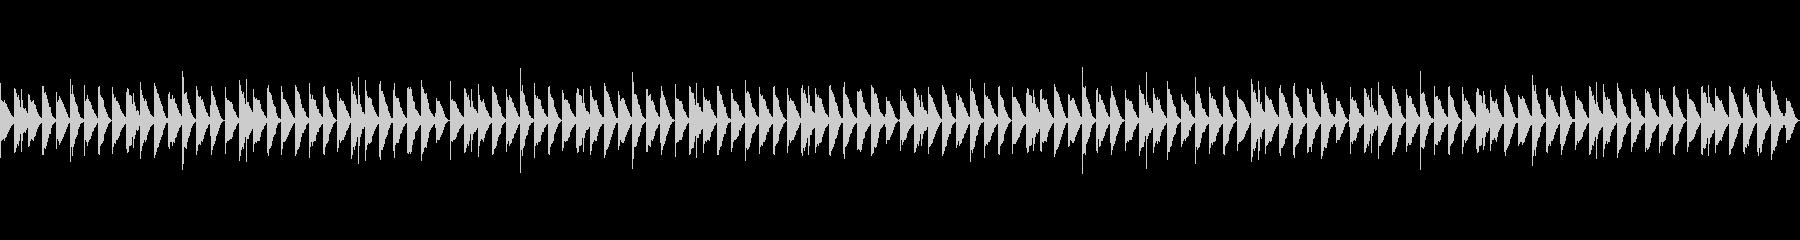 Vtuberの配信BGMの未再生の波形